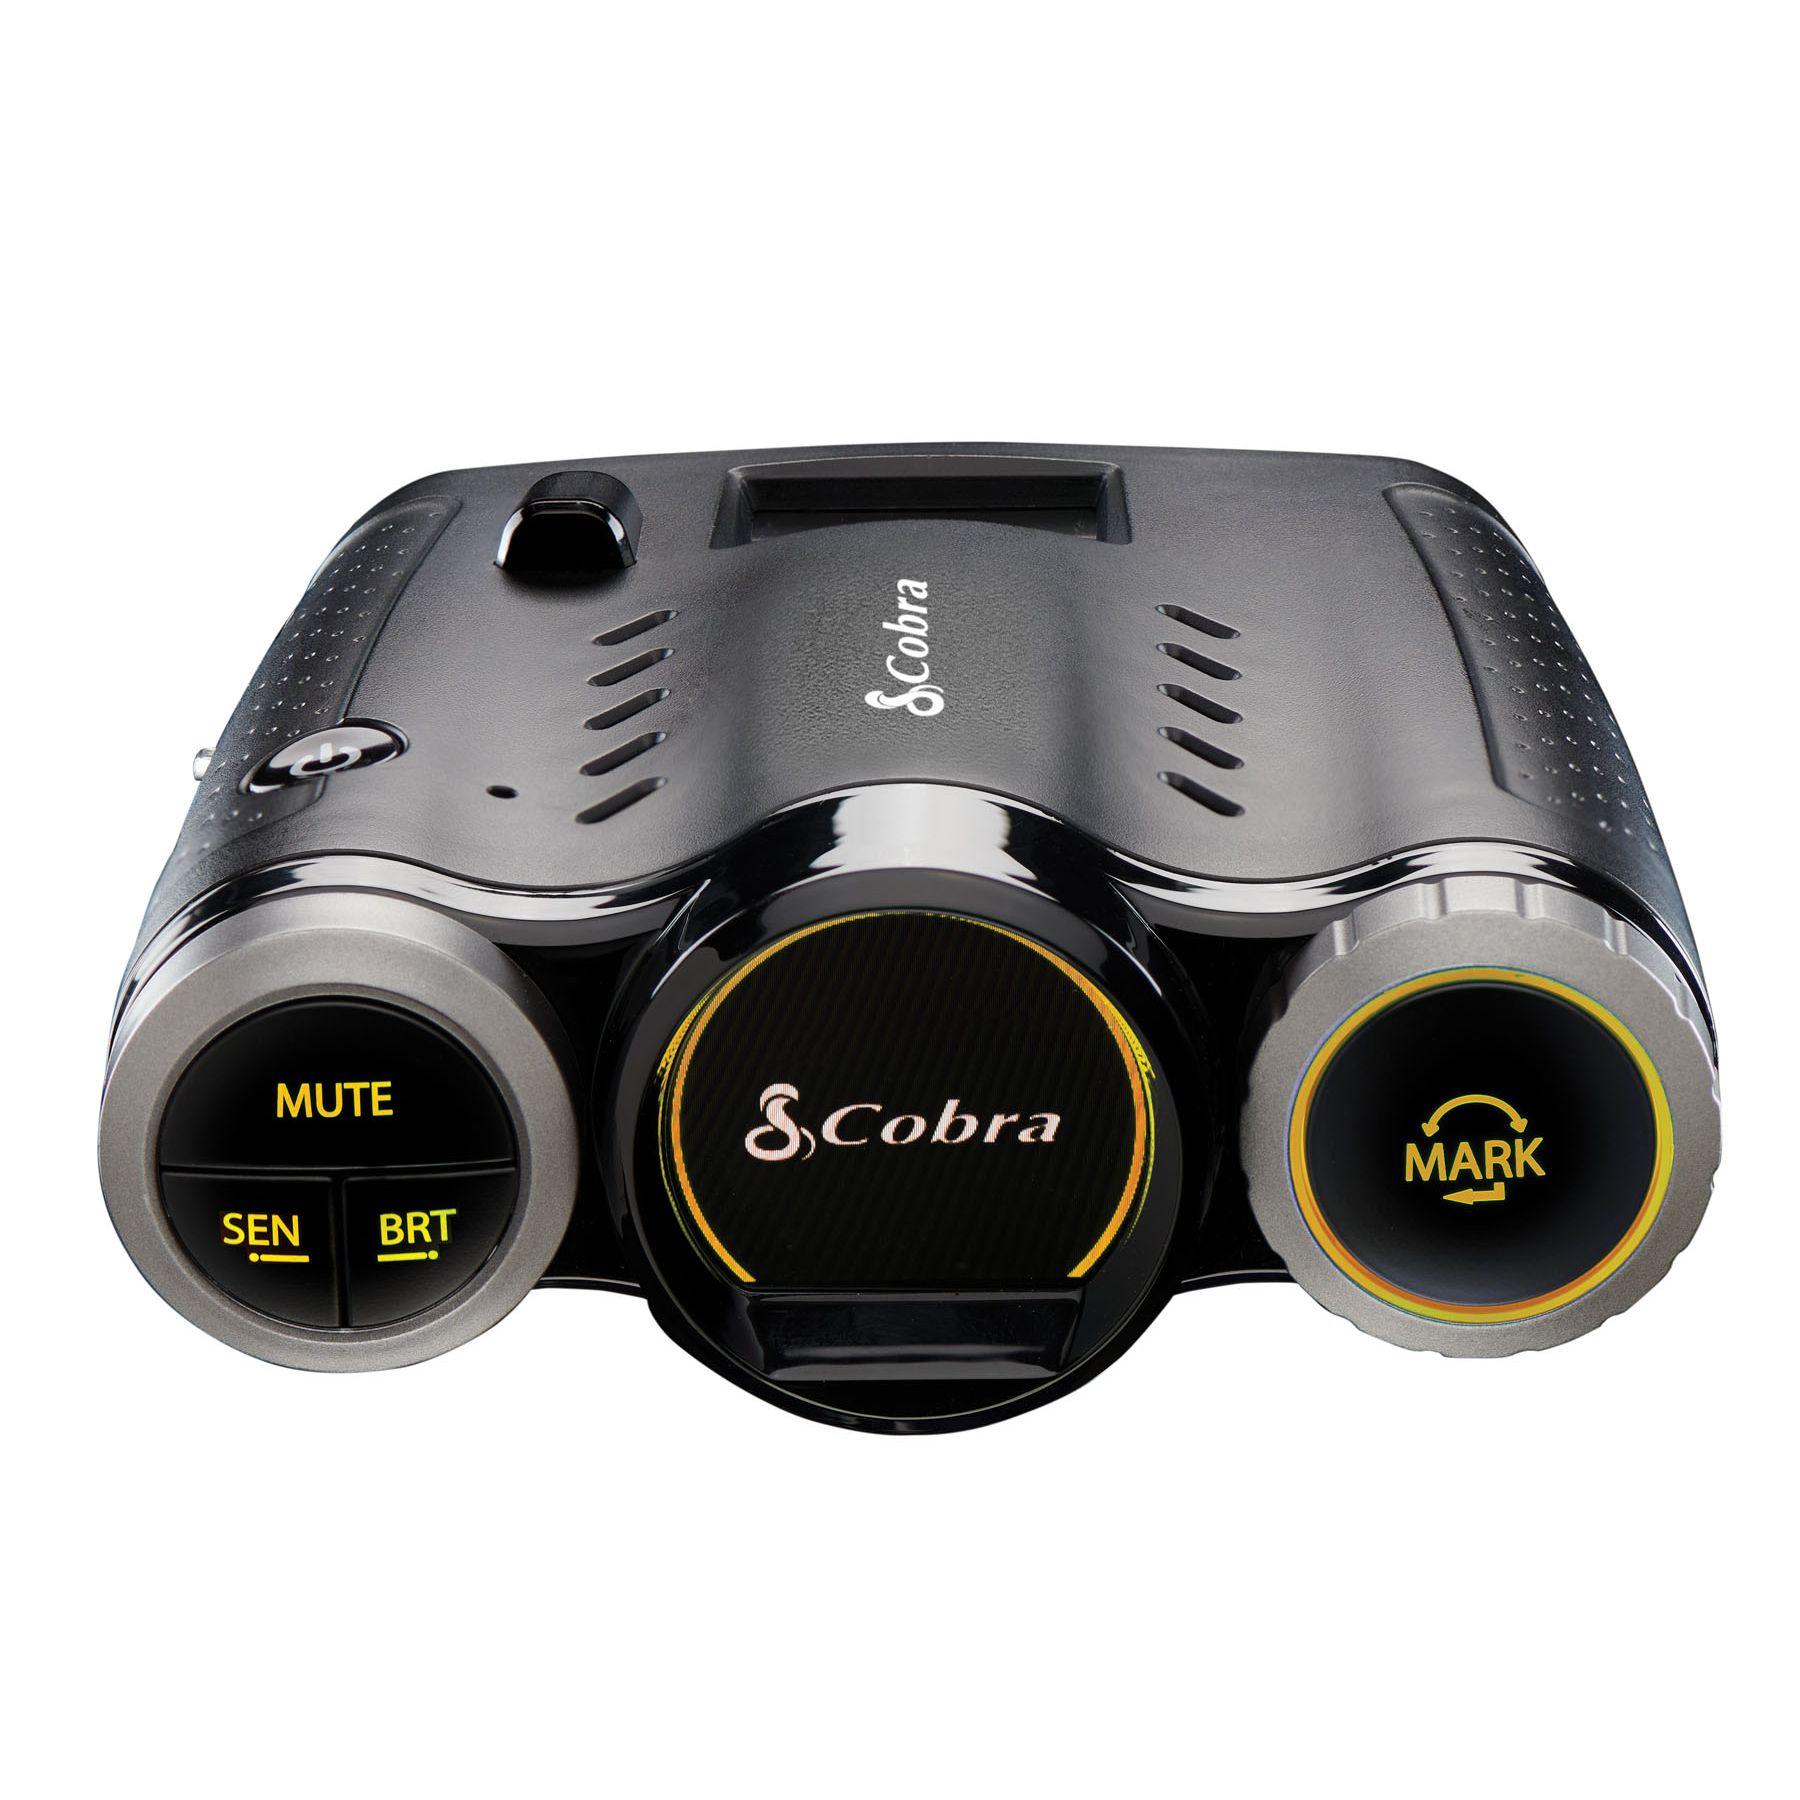 ROAD SCOUT - Dash Cam And Radar Detector Wifi Bluetooth 1080p